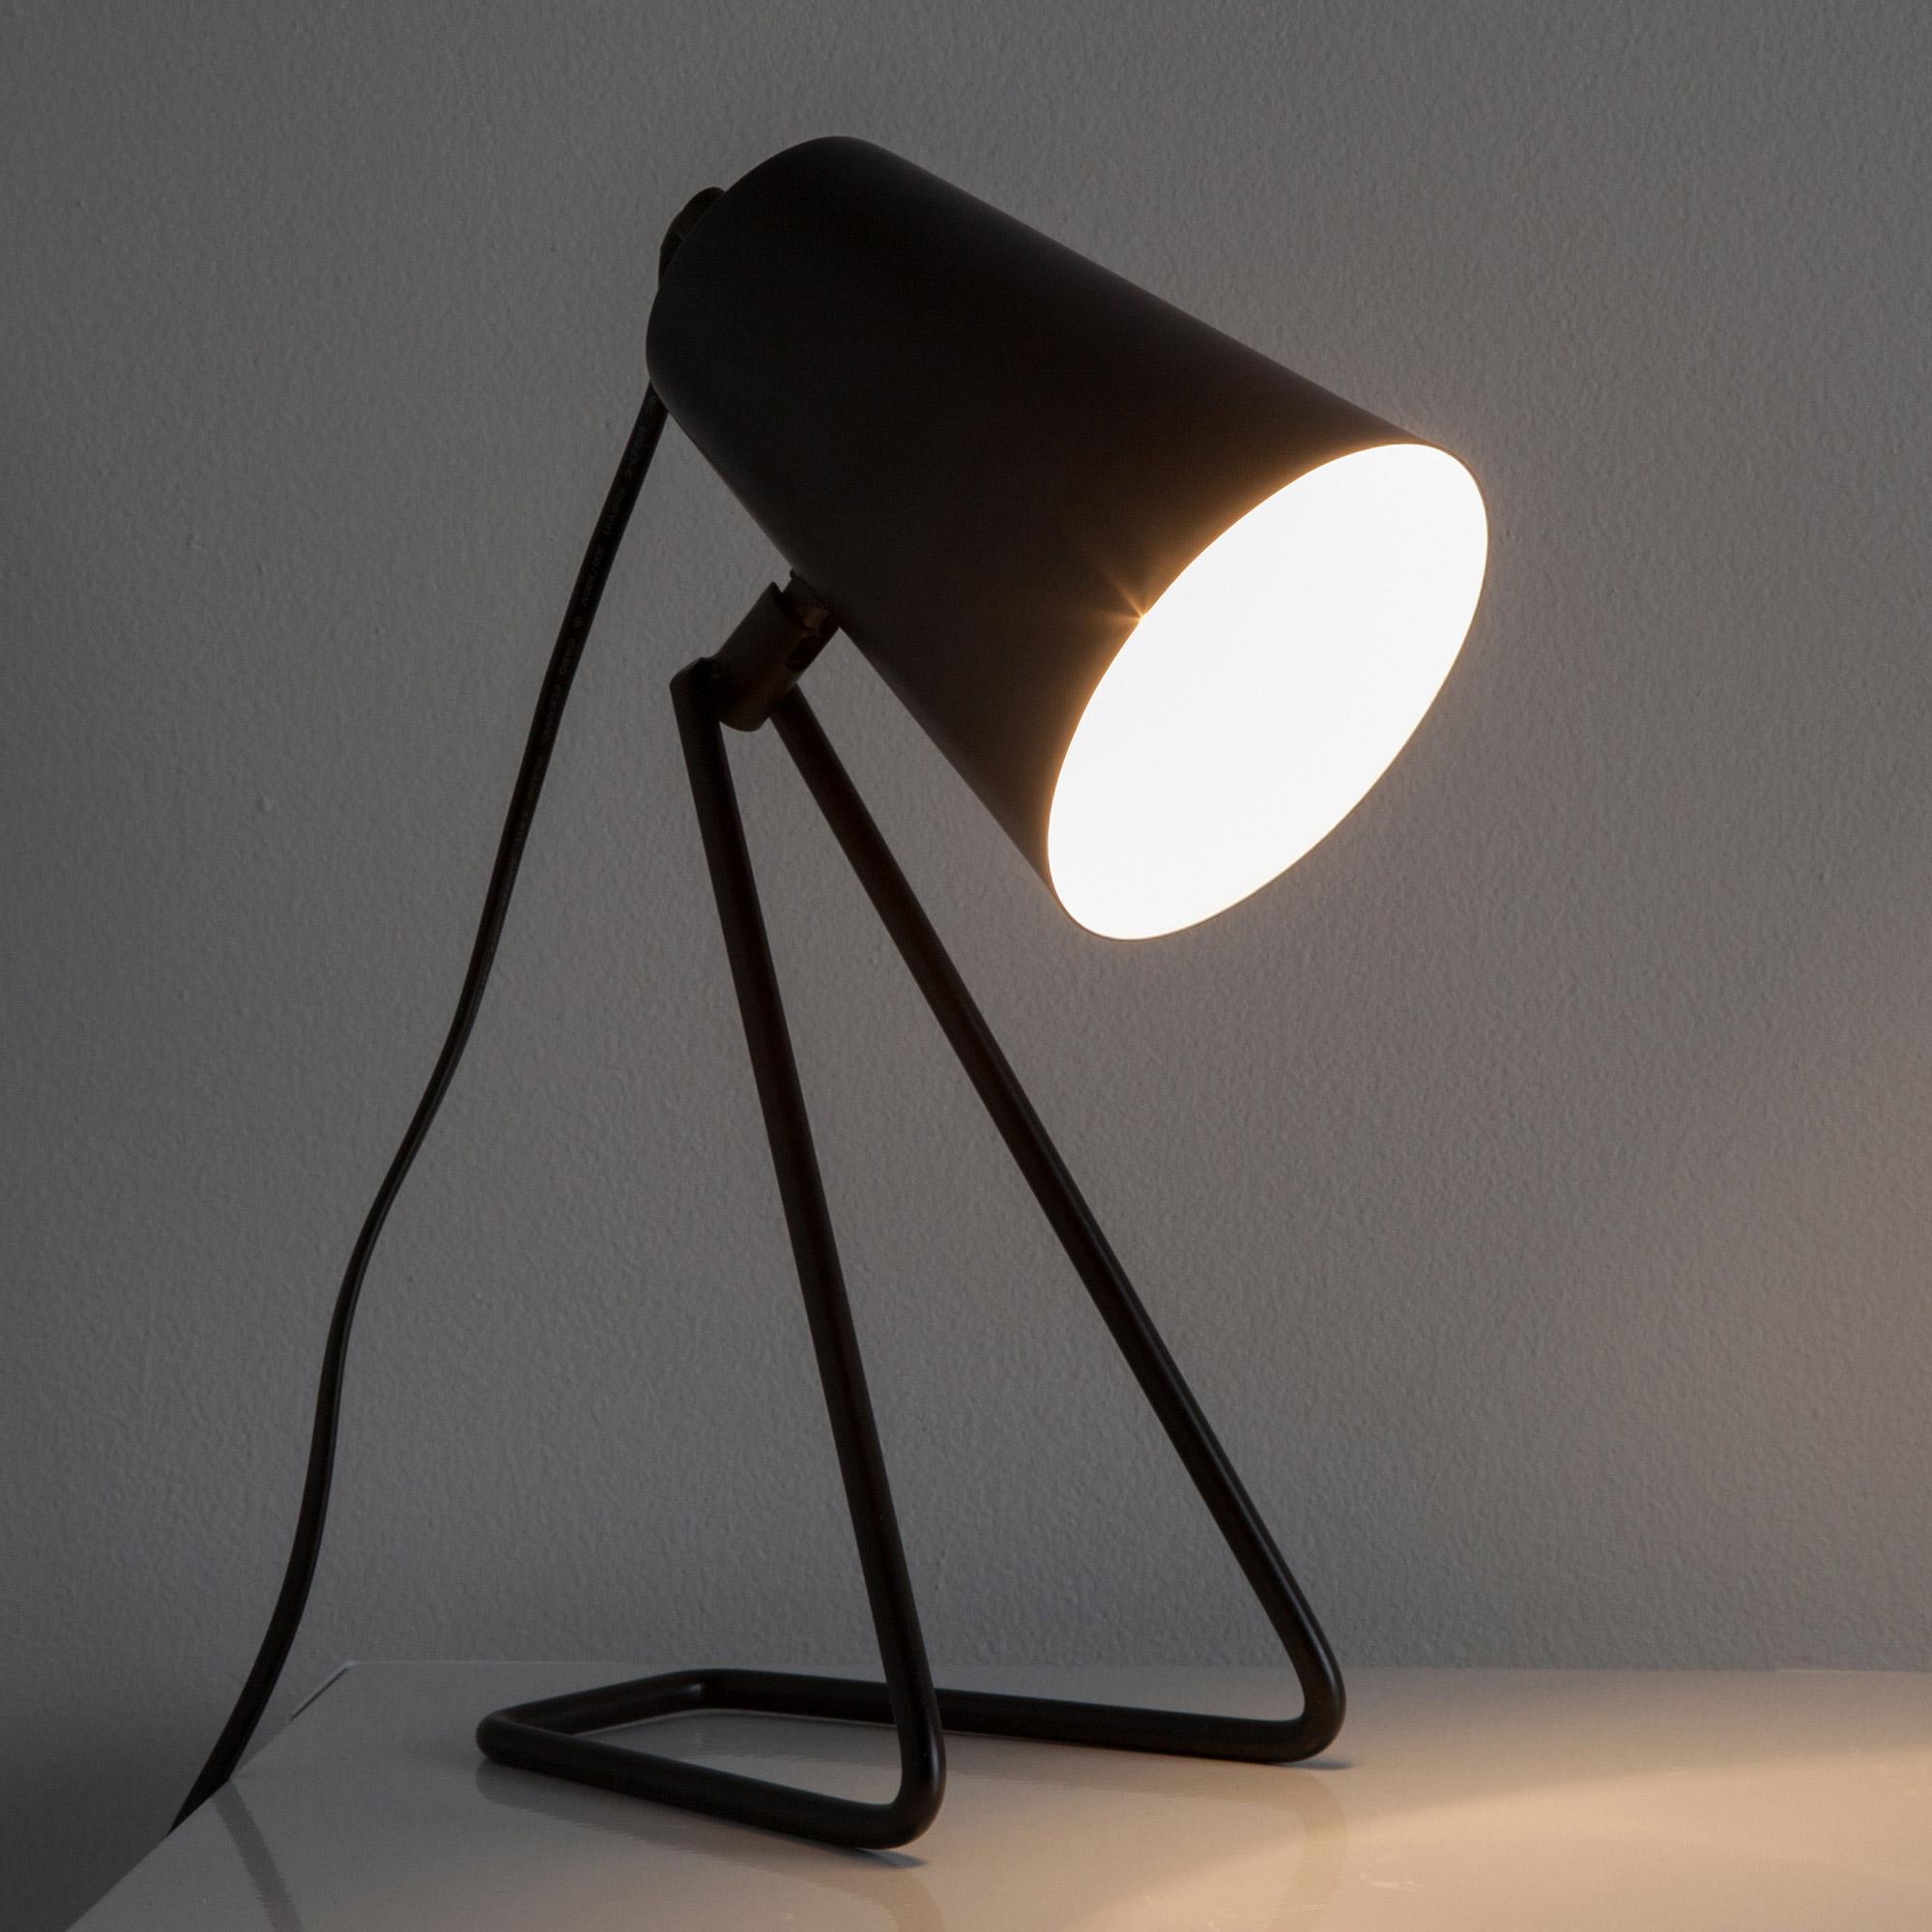 Lampe design métal noir, INSPIRE Moeta